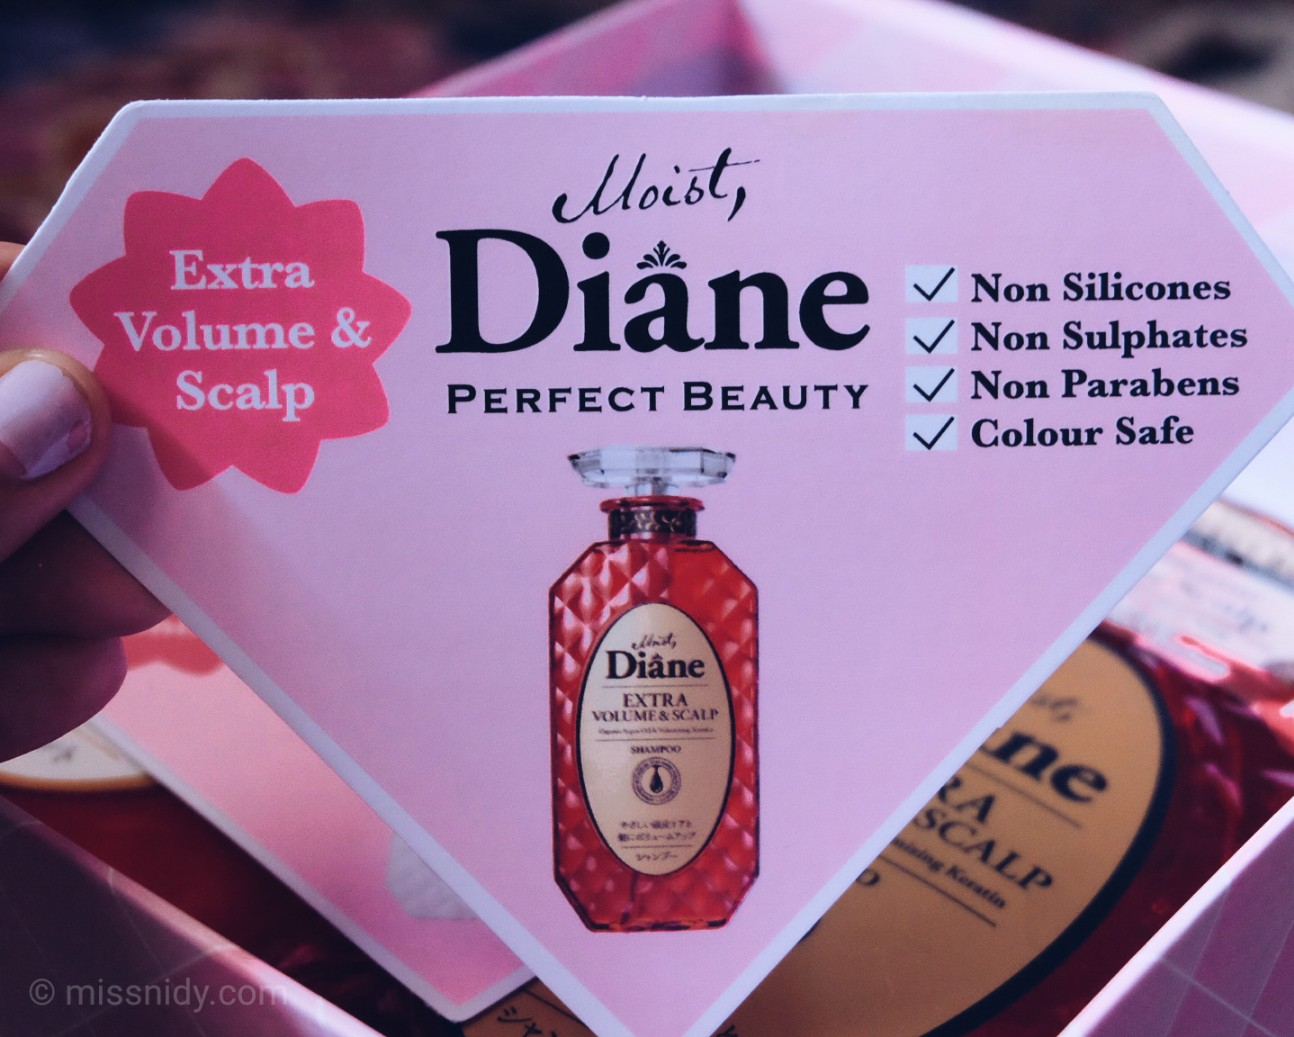 shampoo bebas paraben, silikon, dan sulfat